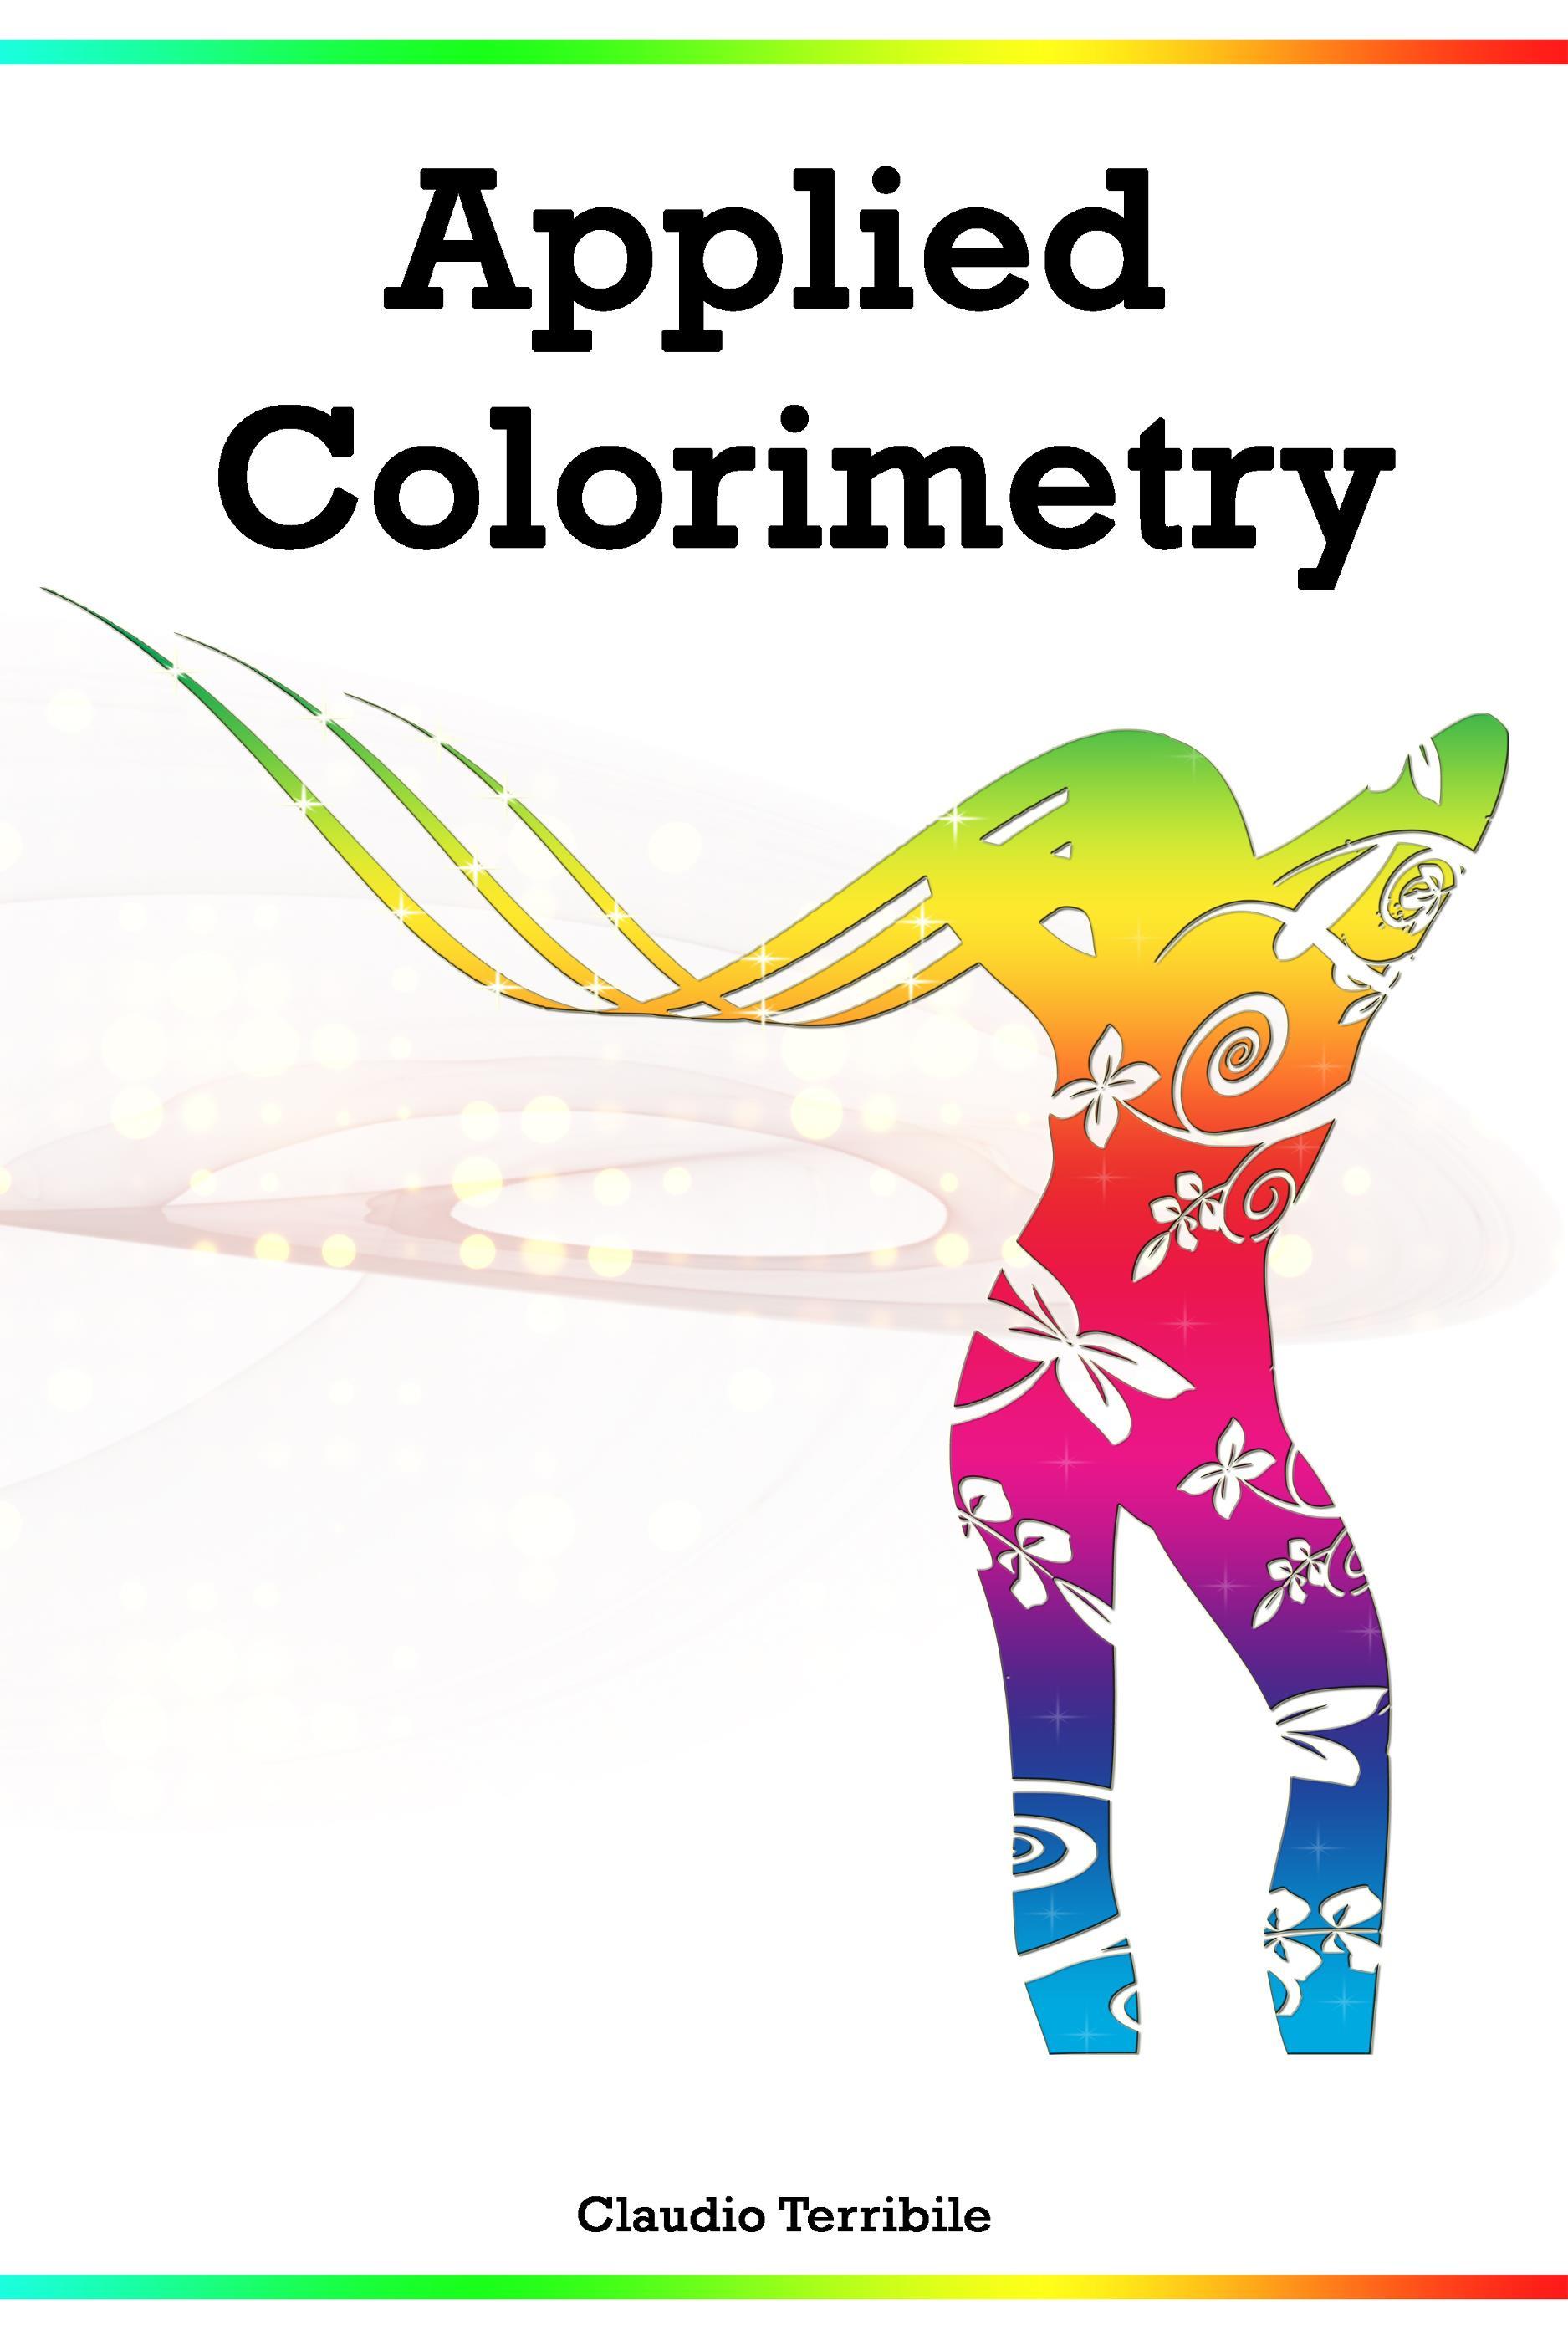 Applied Colorimetry